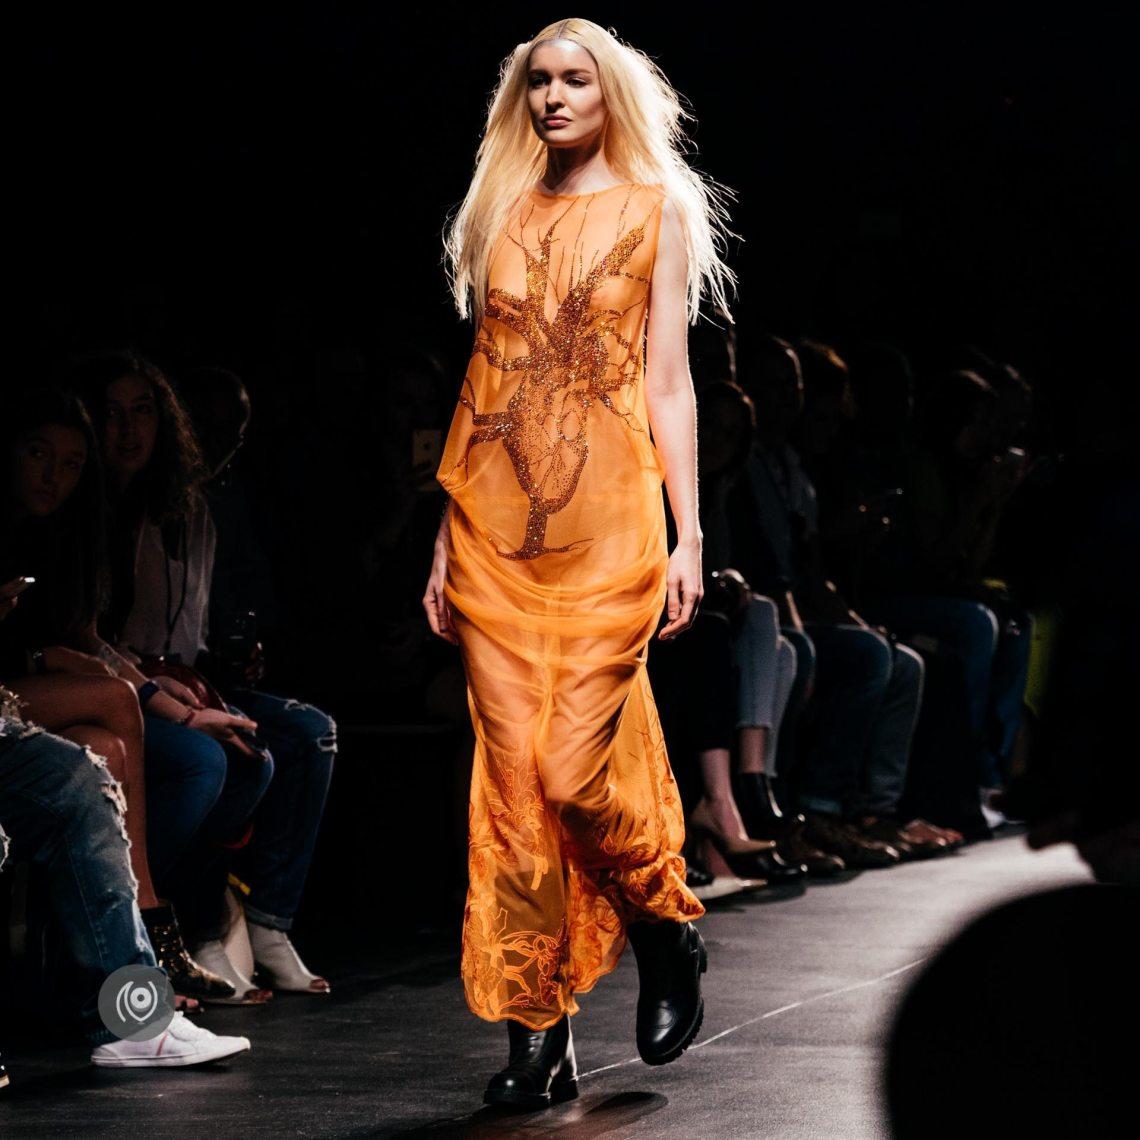 Francesca Liberatore, Heart Center, SS16, NYFW, New York Fashion Week, #EyesForNewYork #REDHUxNYC Naina.co Luxury & Lifestyle, Photographer Storyteller, Blogger